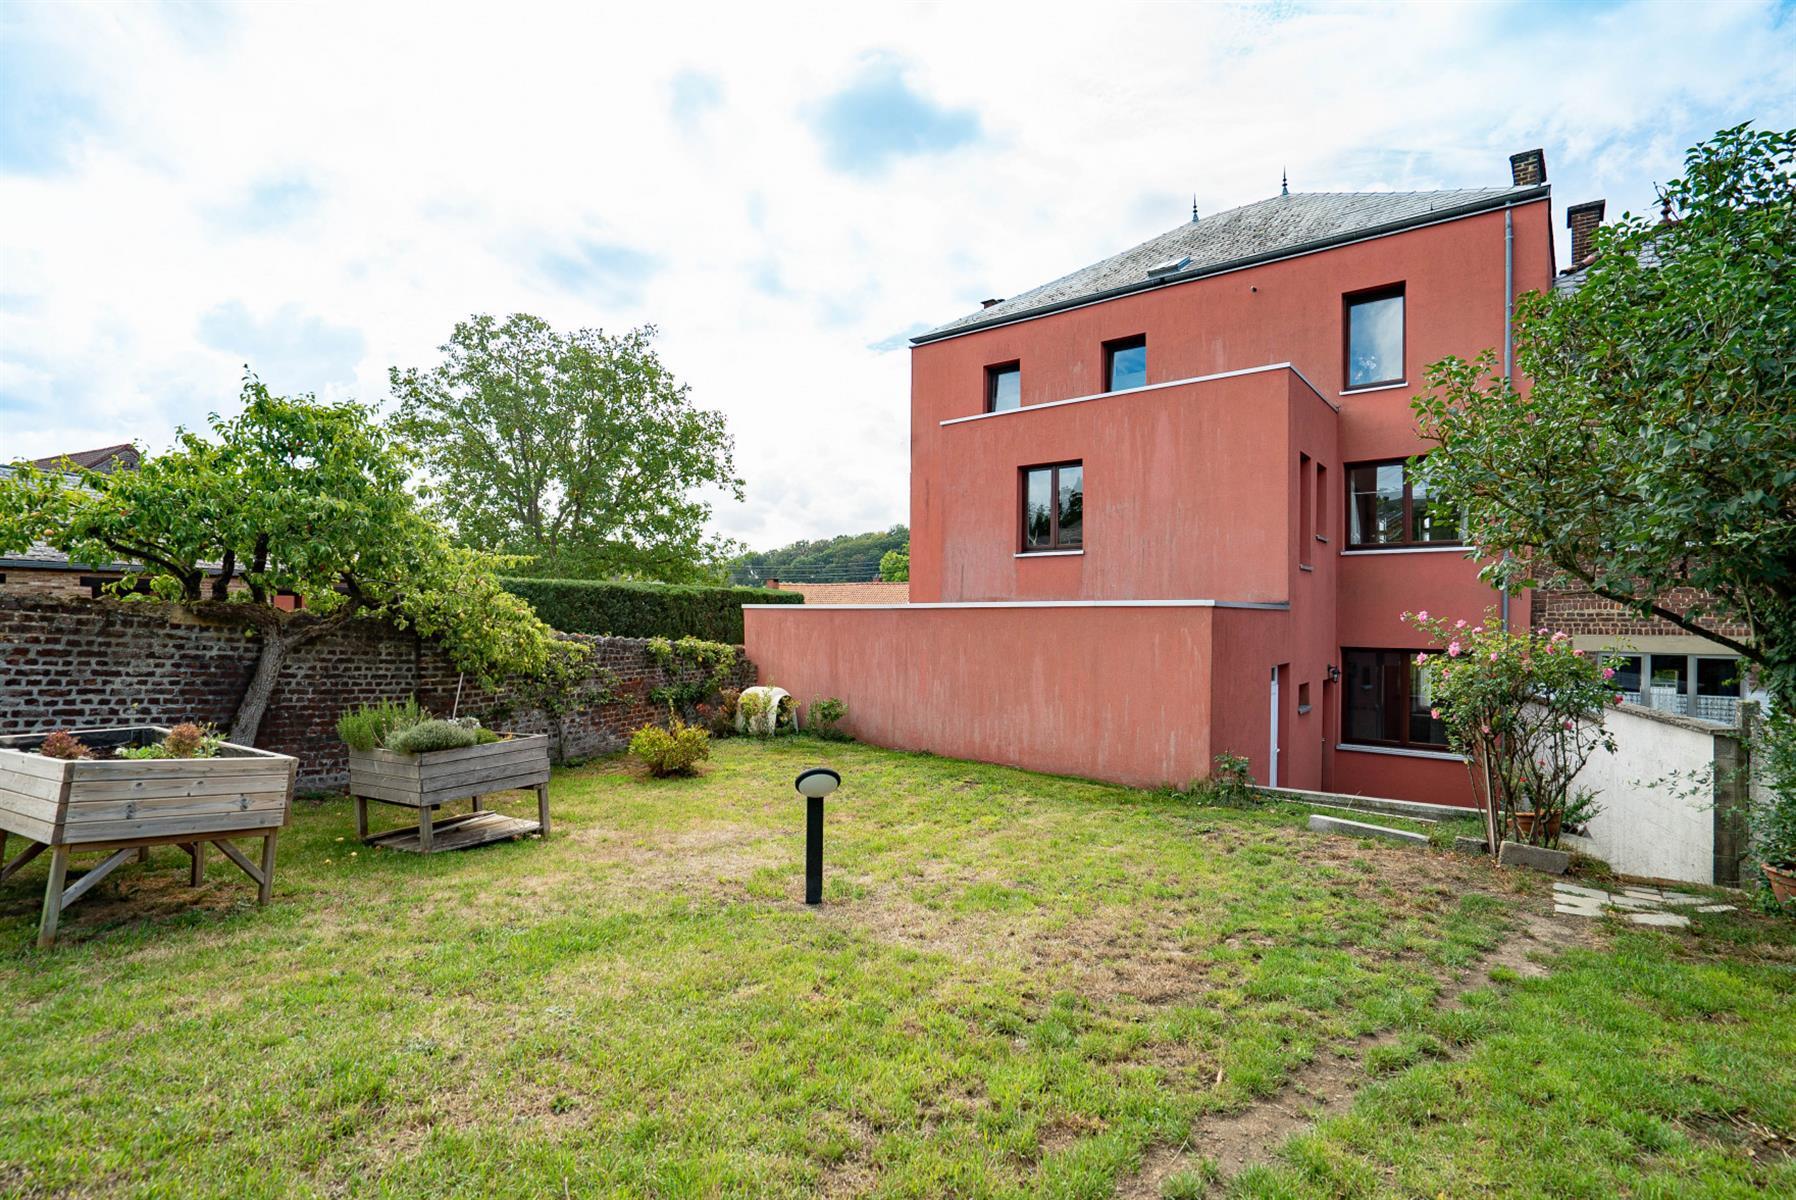 Maison - Bousval - #4131618-22